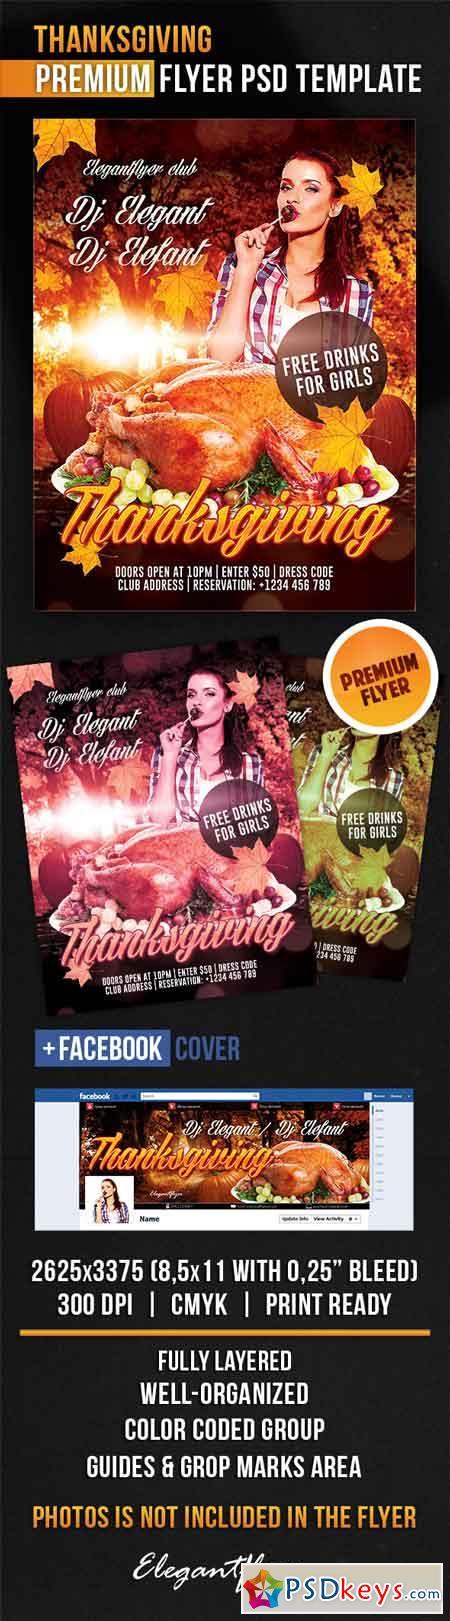 Thanksgiving – Flyer PSD Template + Facebook Cover 3